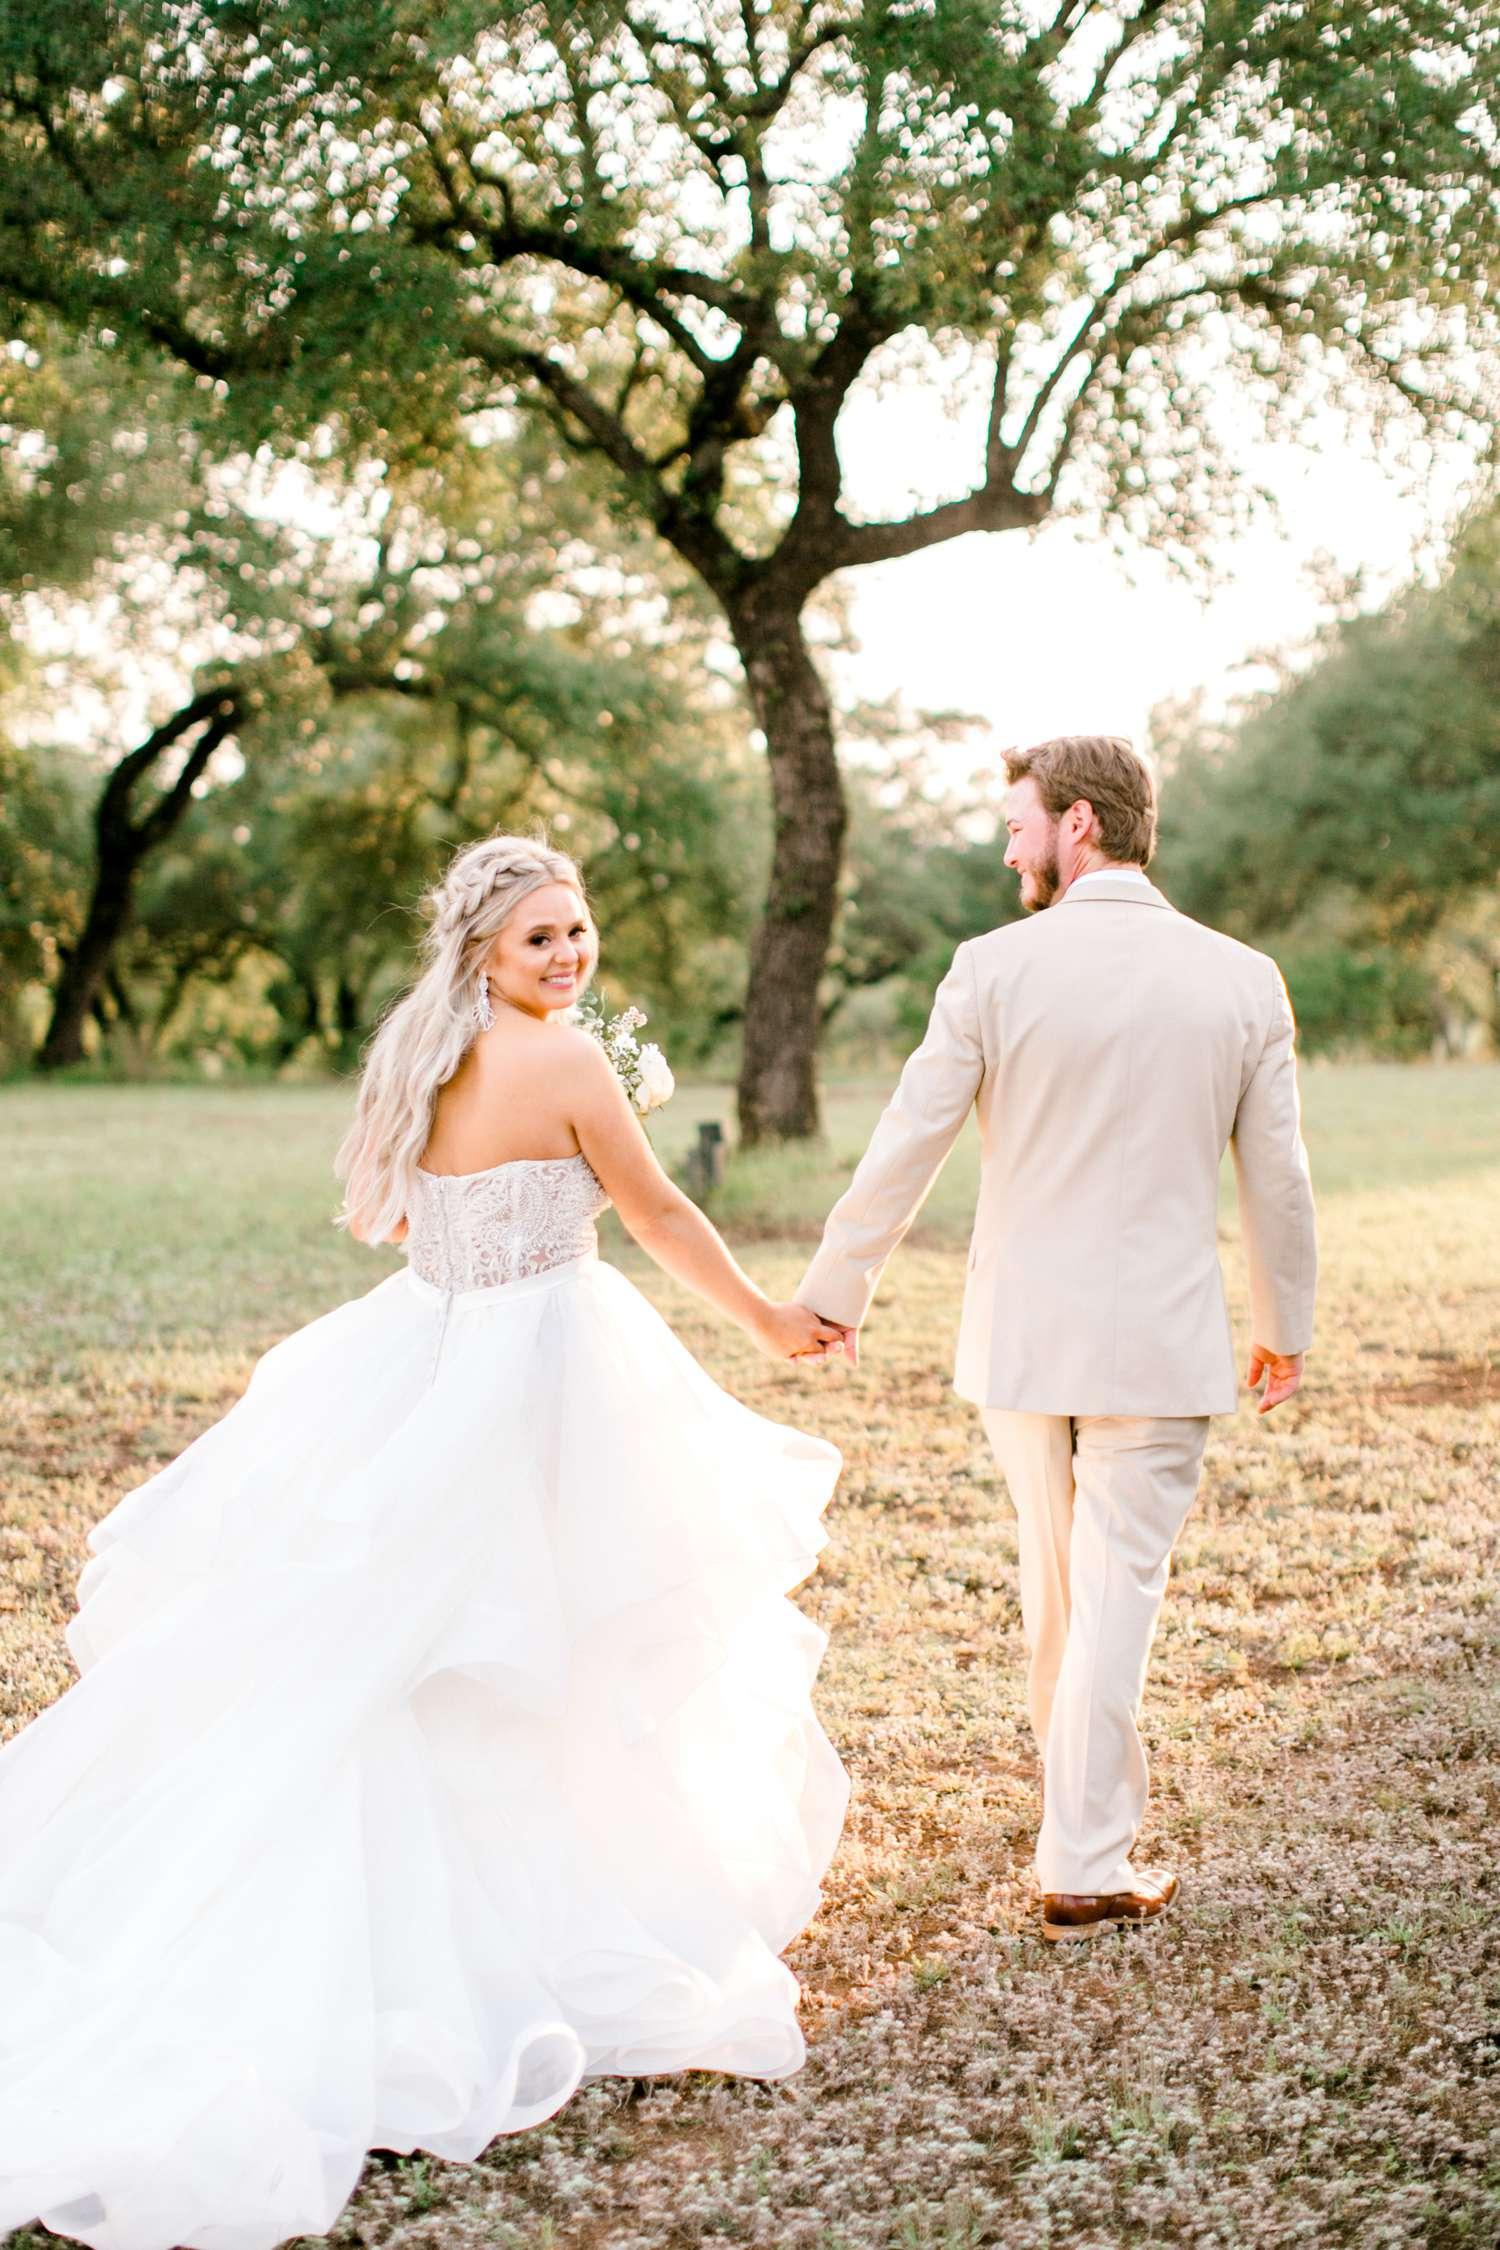 HAYLEE+JUSTIN+GREGORY+HERITAGE_HAUS_AUSTIN_TEXAS_WEDDING_0133.jpg